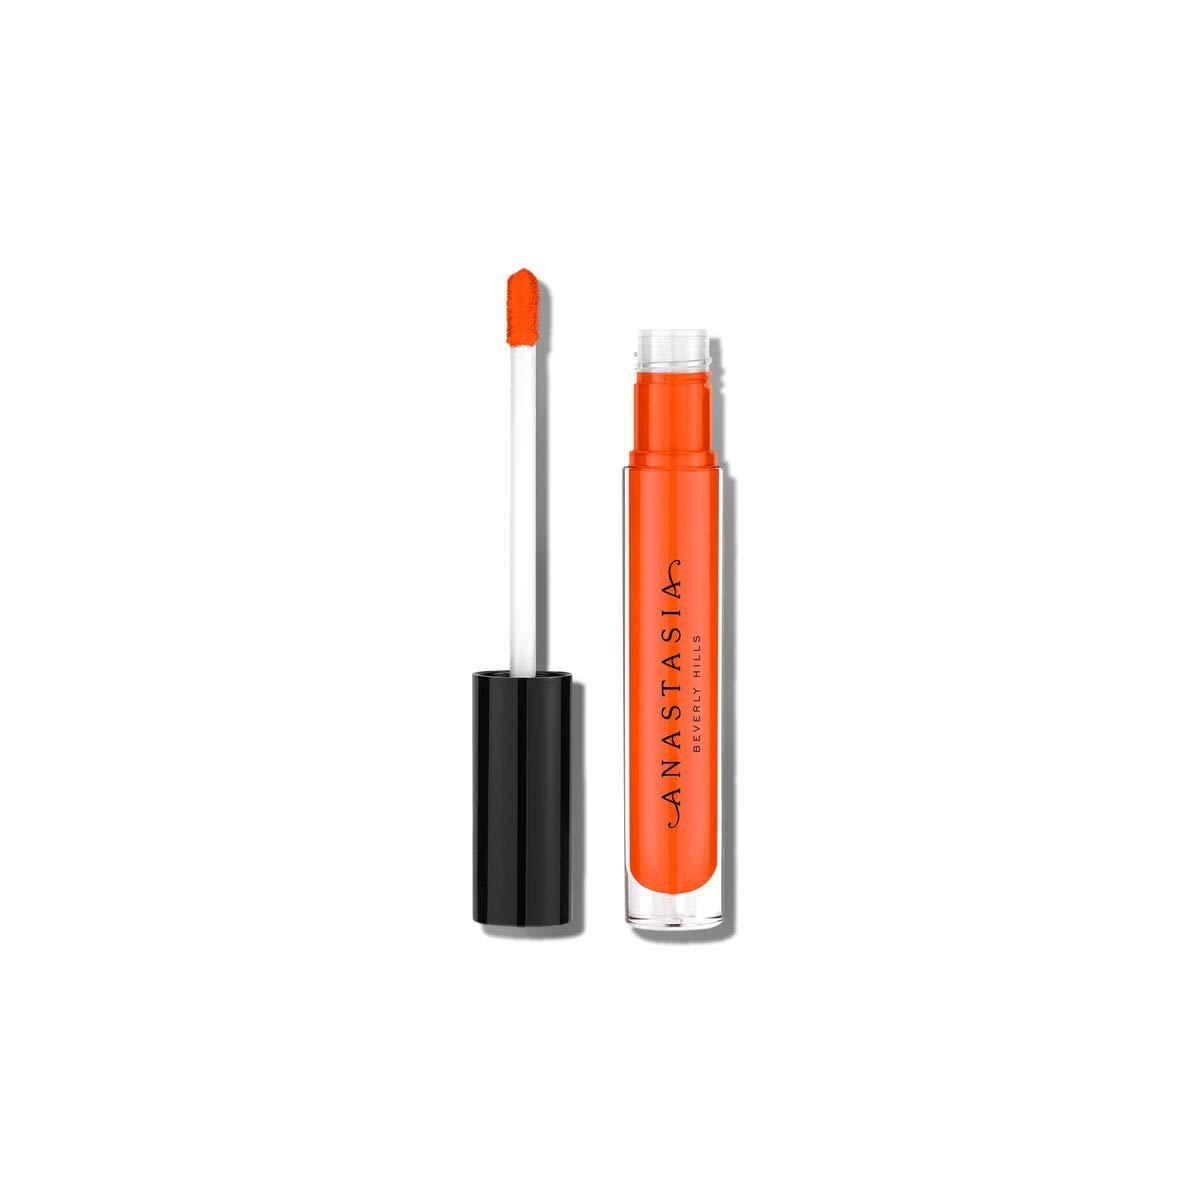 Anastasia Beverly Hills - Lip Gloss - Flame - Deep orange